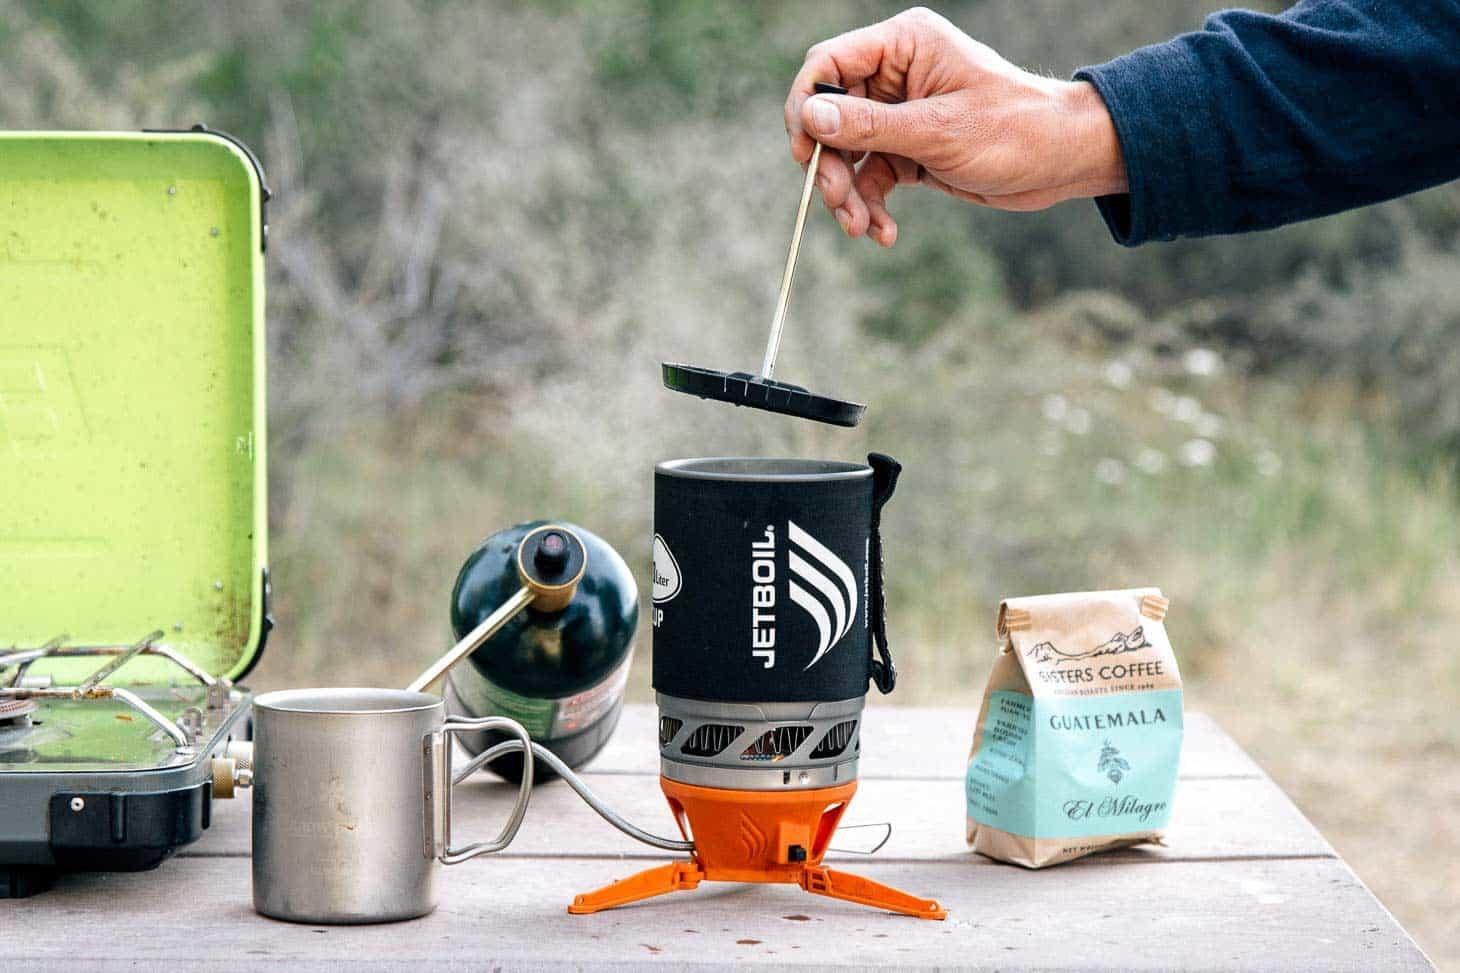 Jetboil Coffee Maker